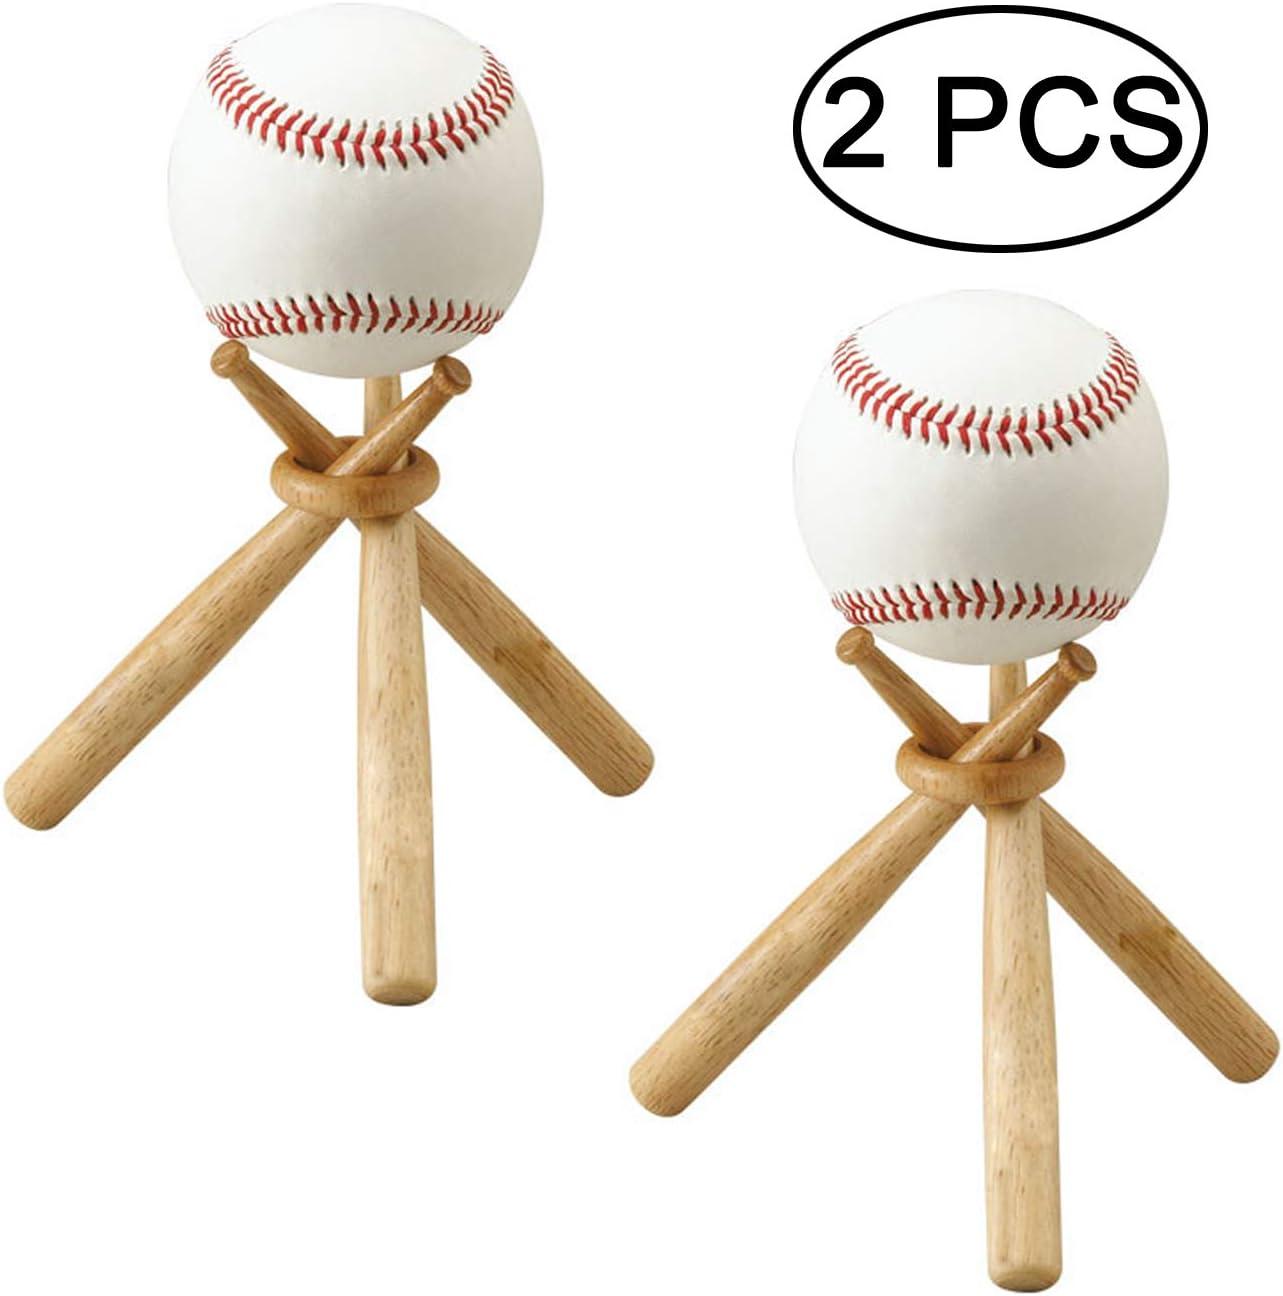 TIHOOD Baseball Stand Baseball Stand Holder Wooden Base Ball Stand Display Holder